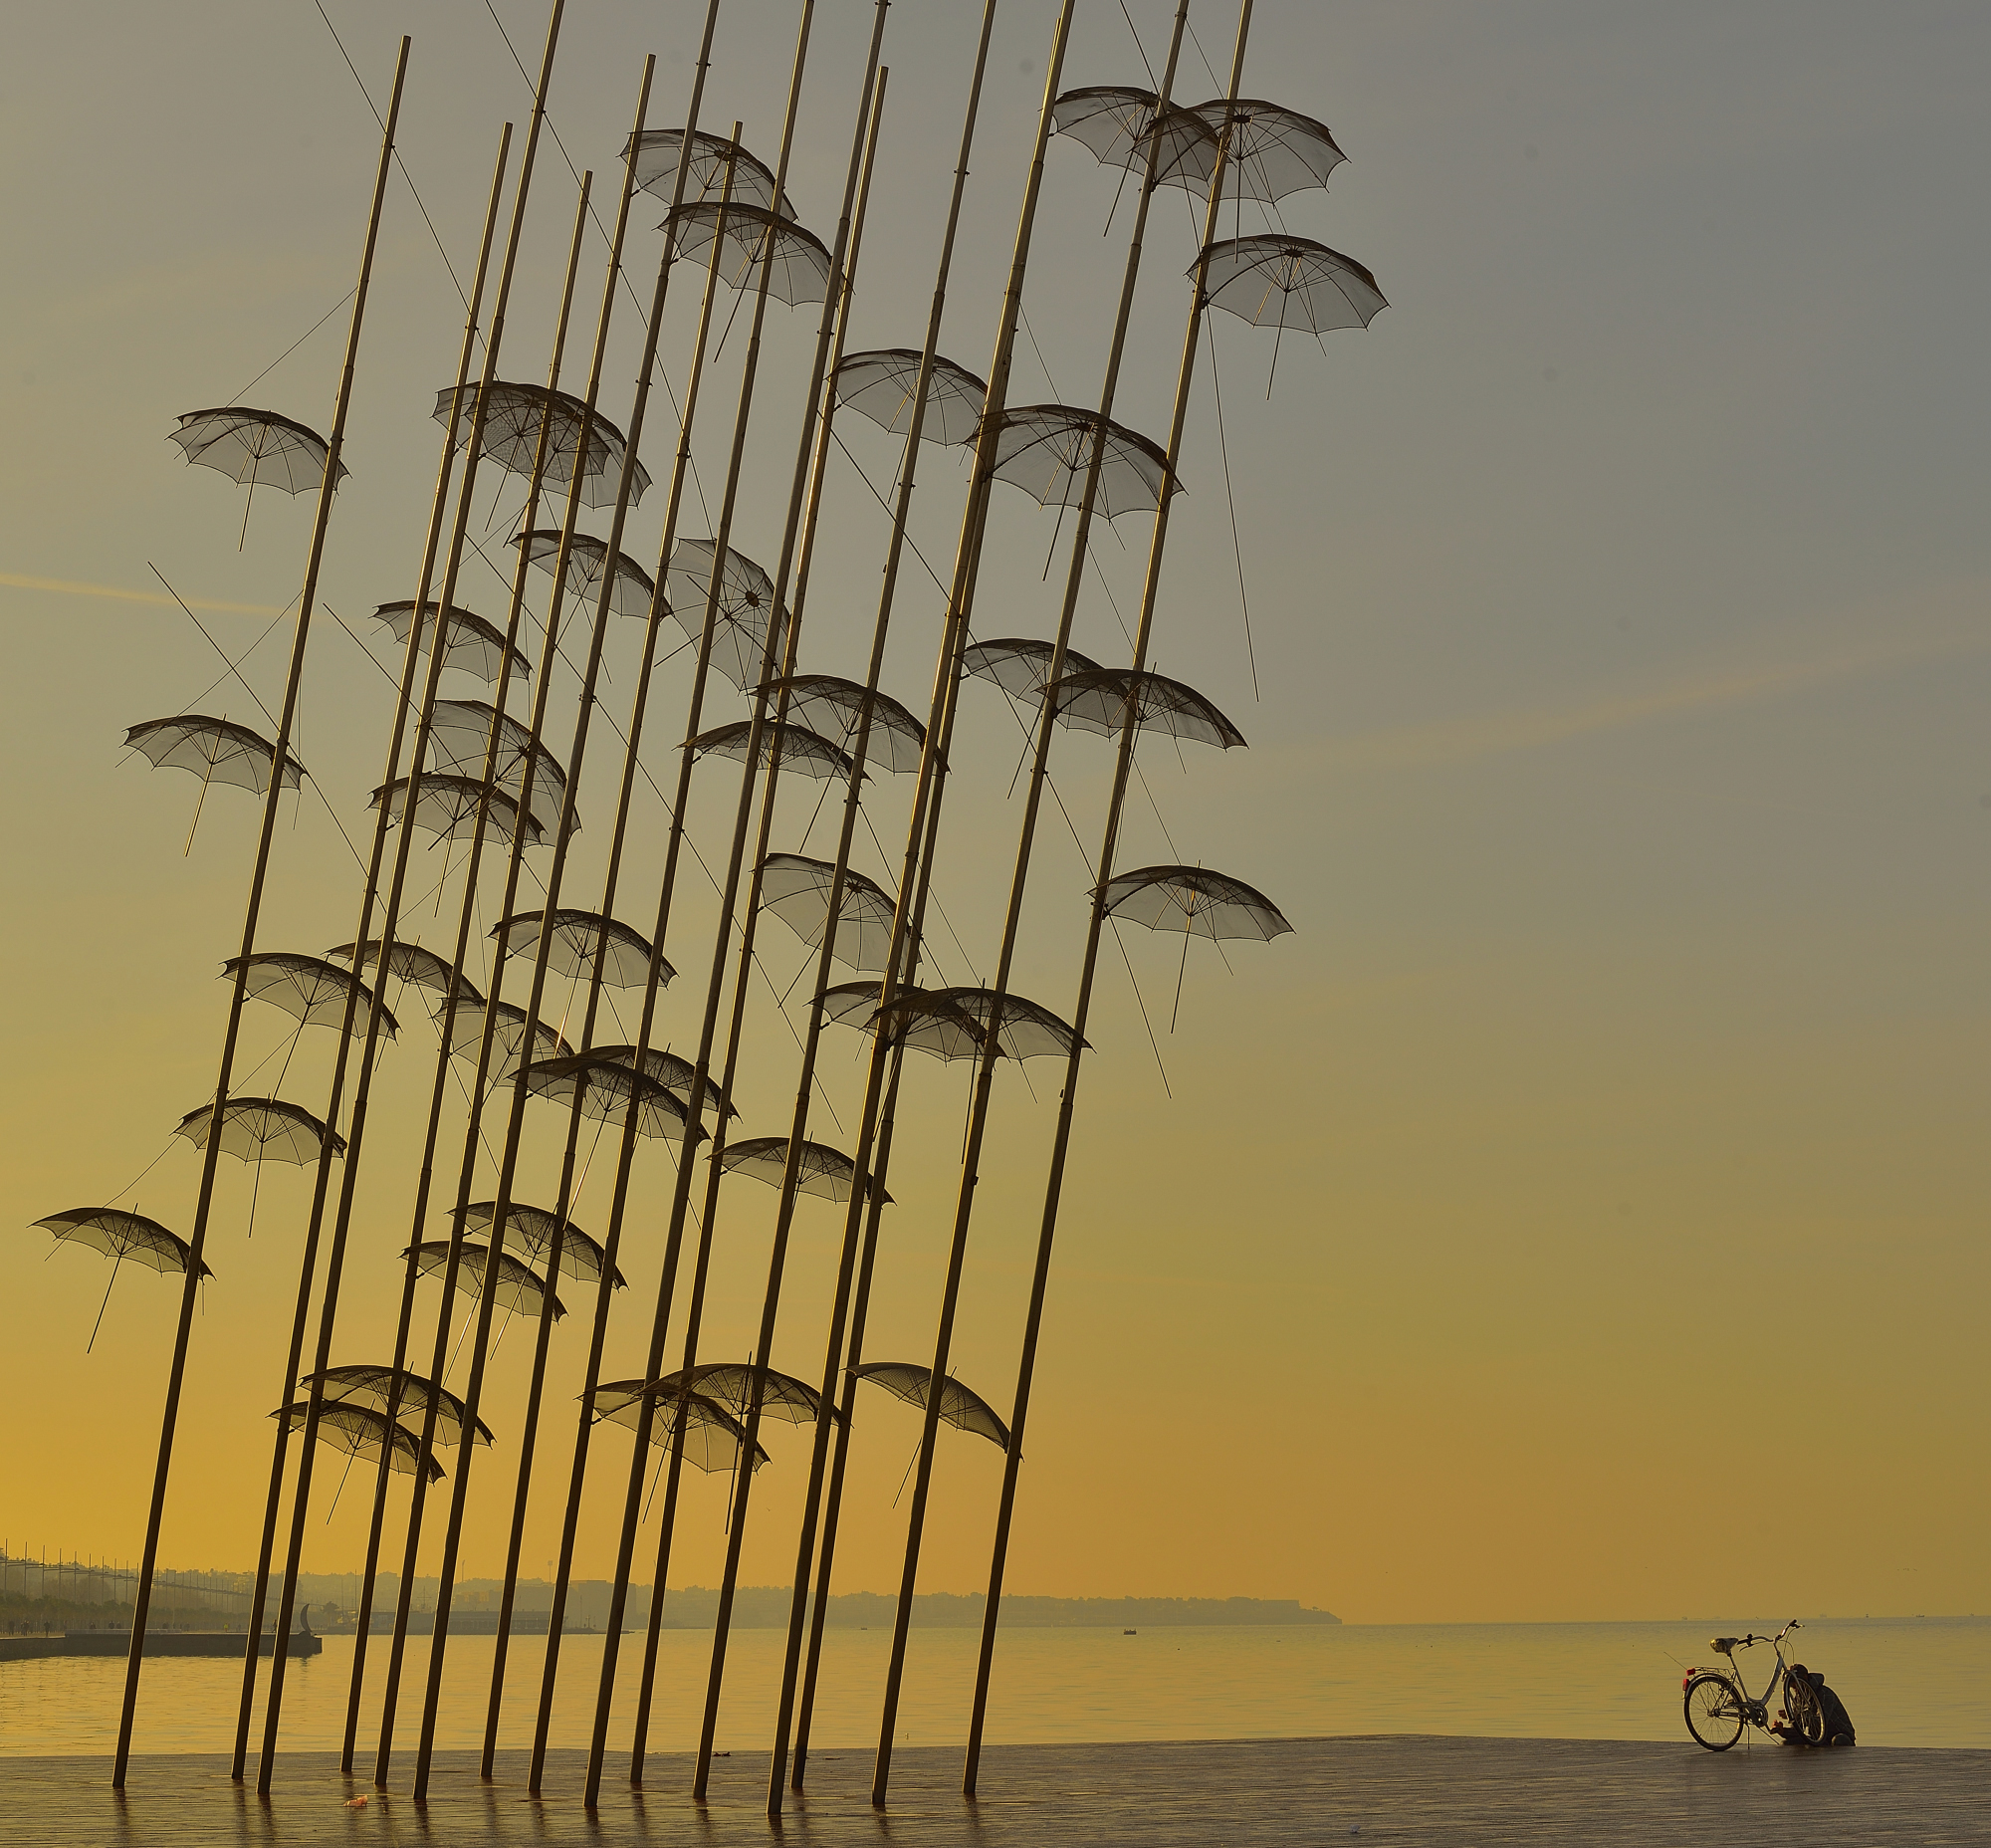 Umbrellas on the Promenade of Thessaloniki, Greece